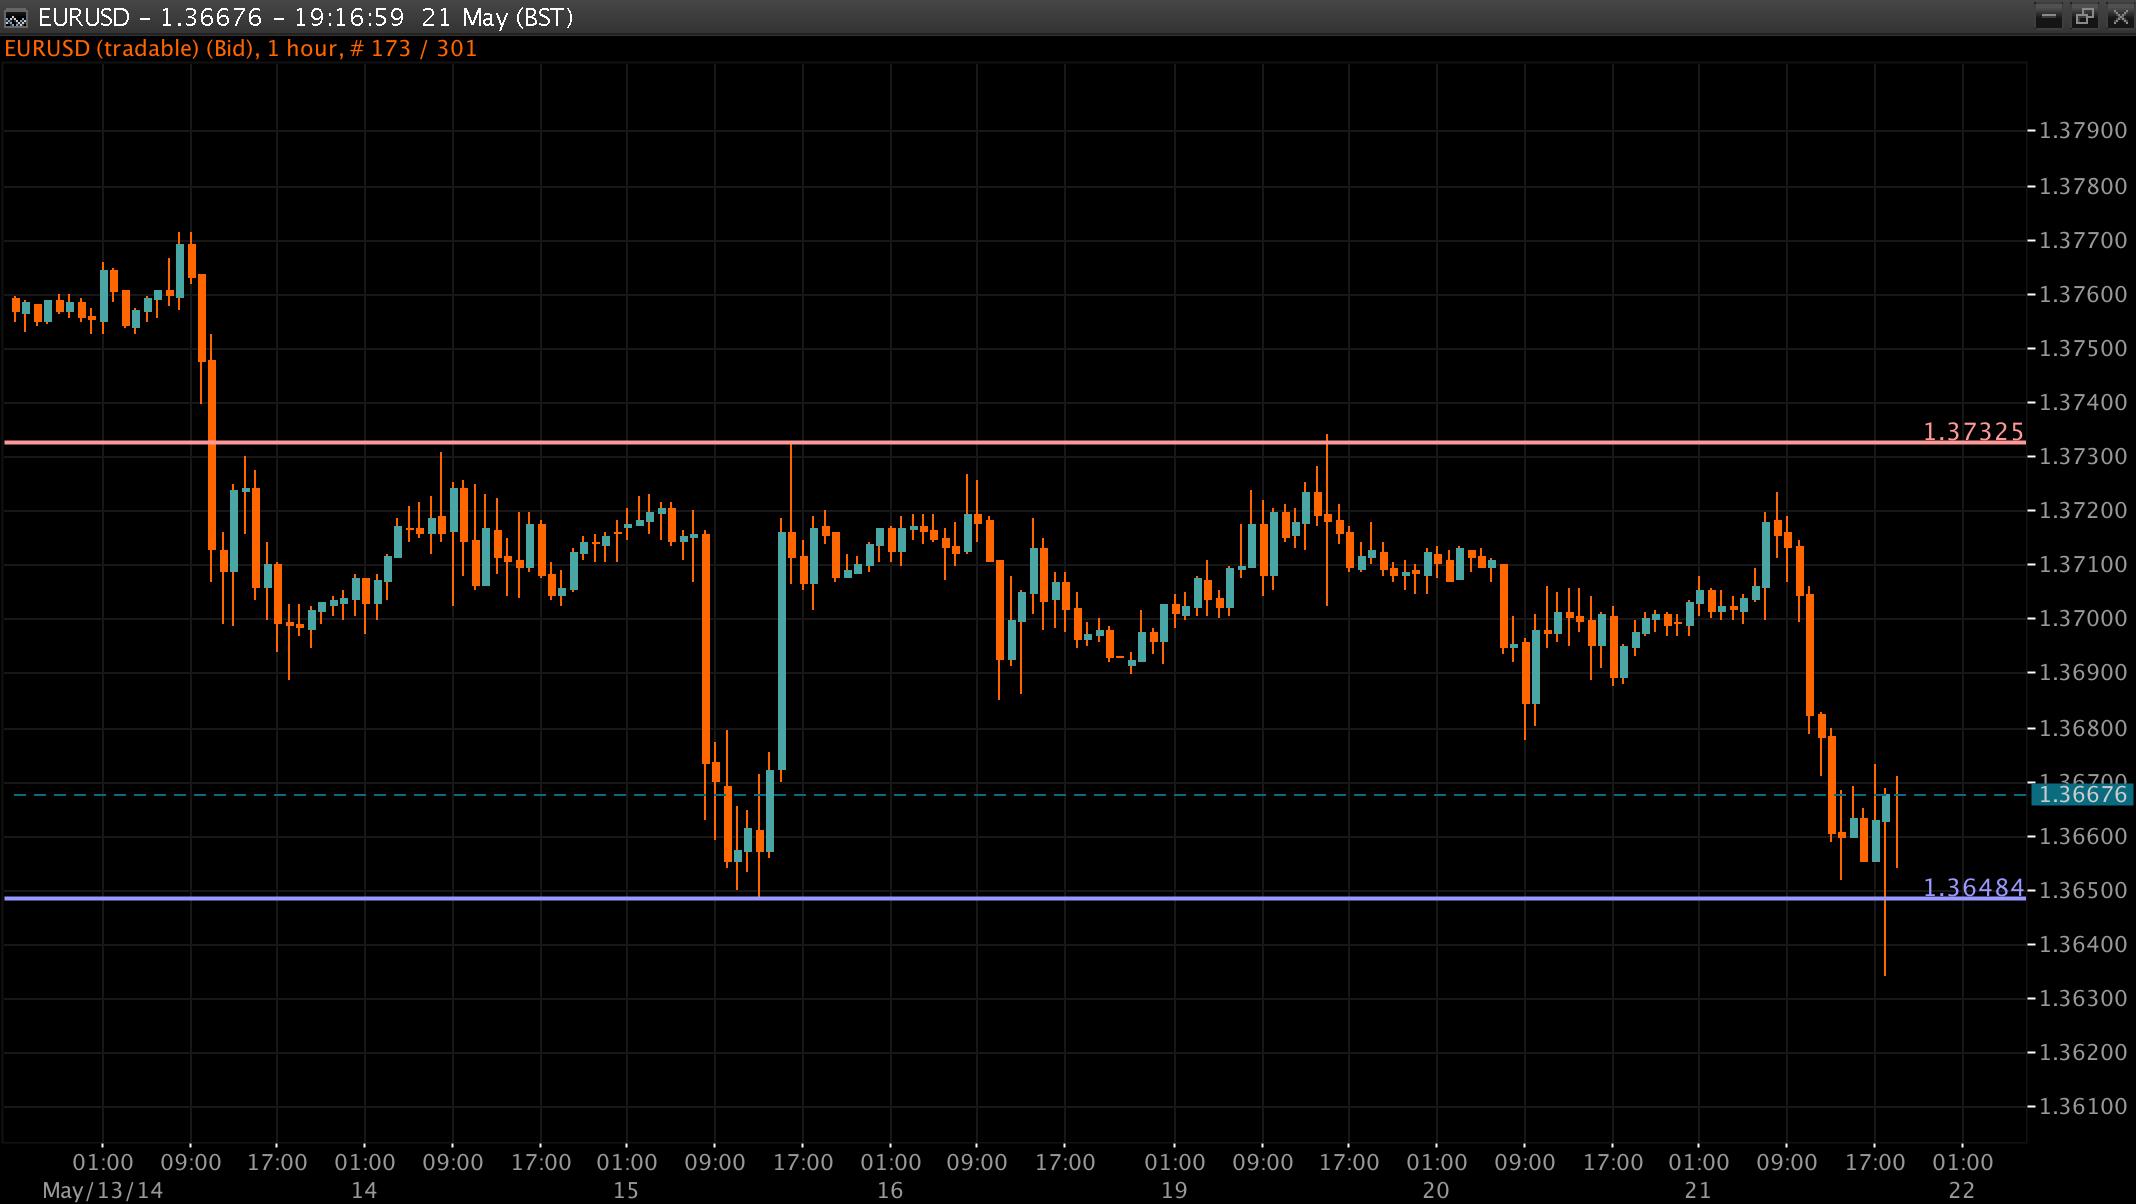 EUR/USD Chart 21 May 2014